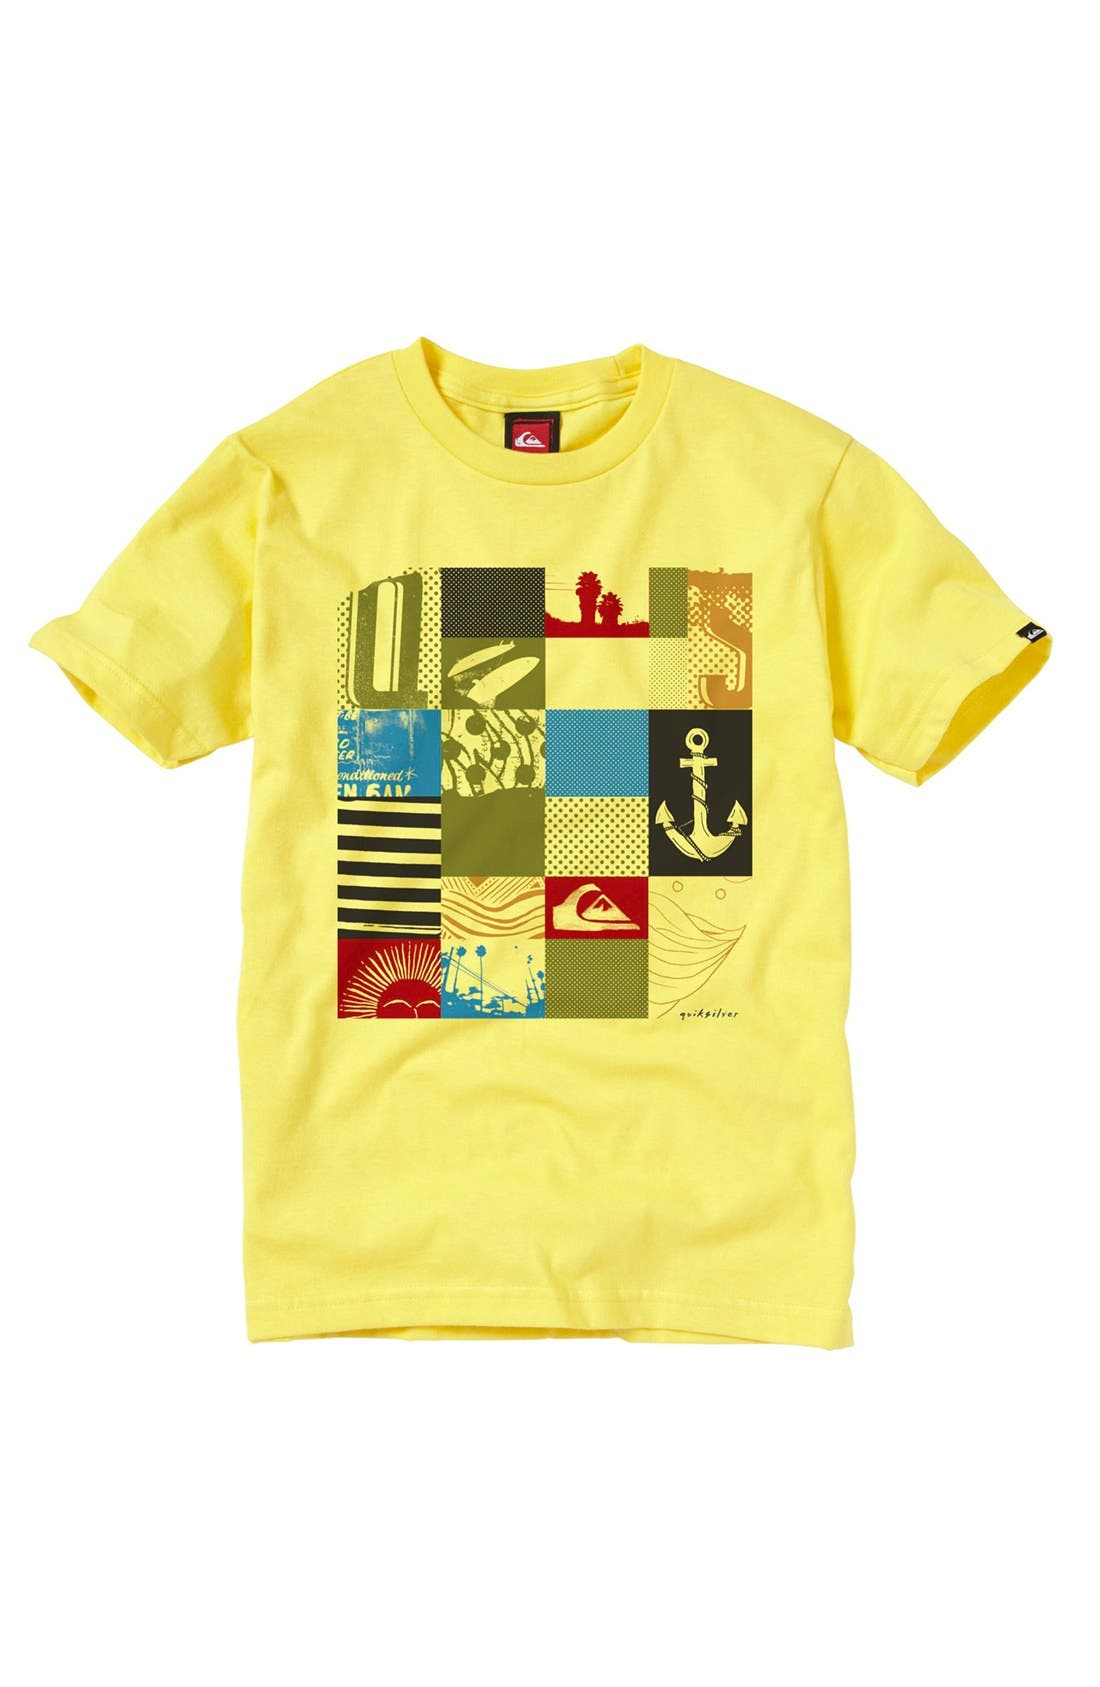 Alternate Image 1 Selected - Quiksilver 'Junk Drawer' T-Shirt (Big Boys)